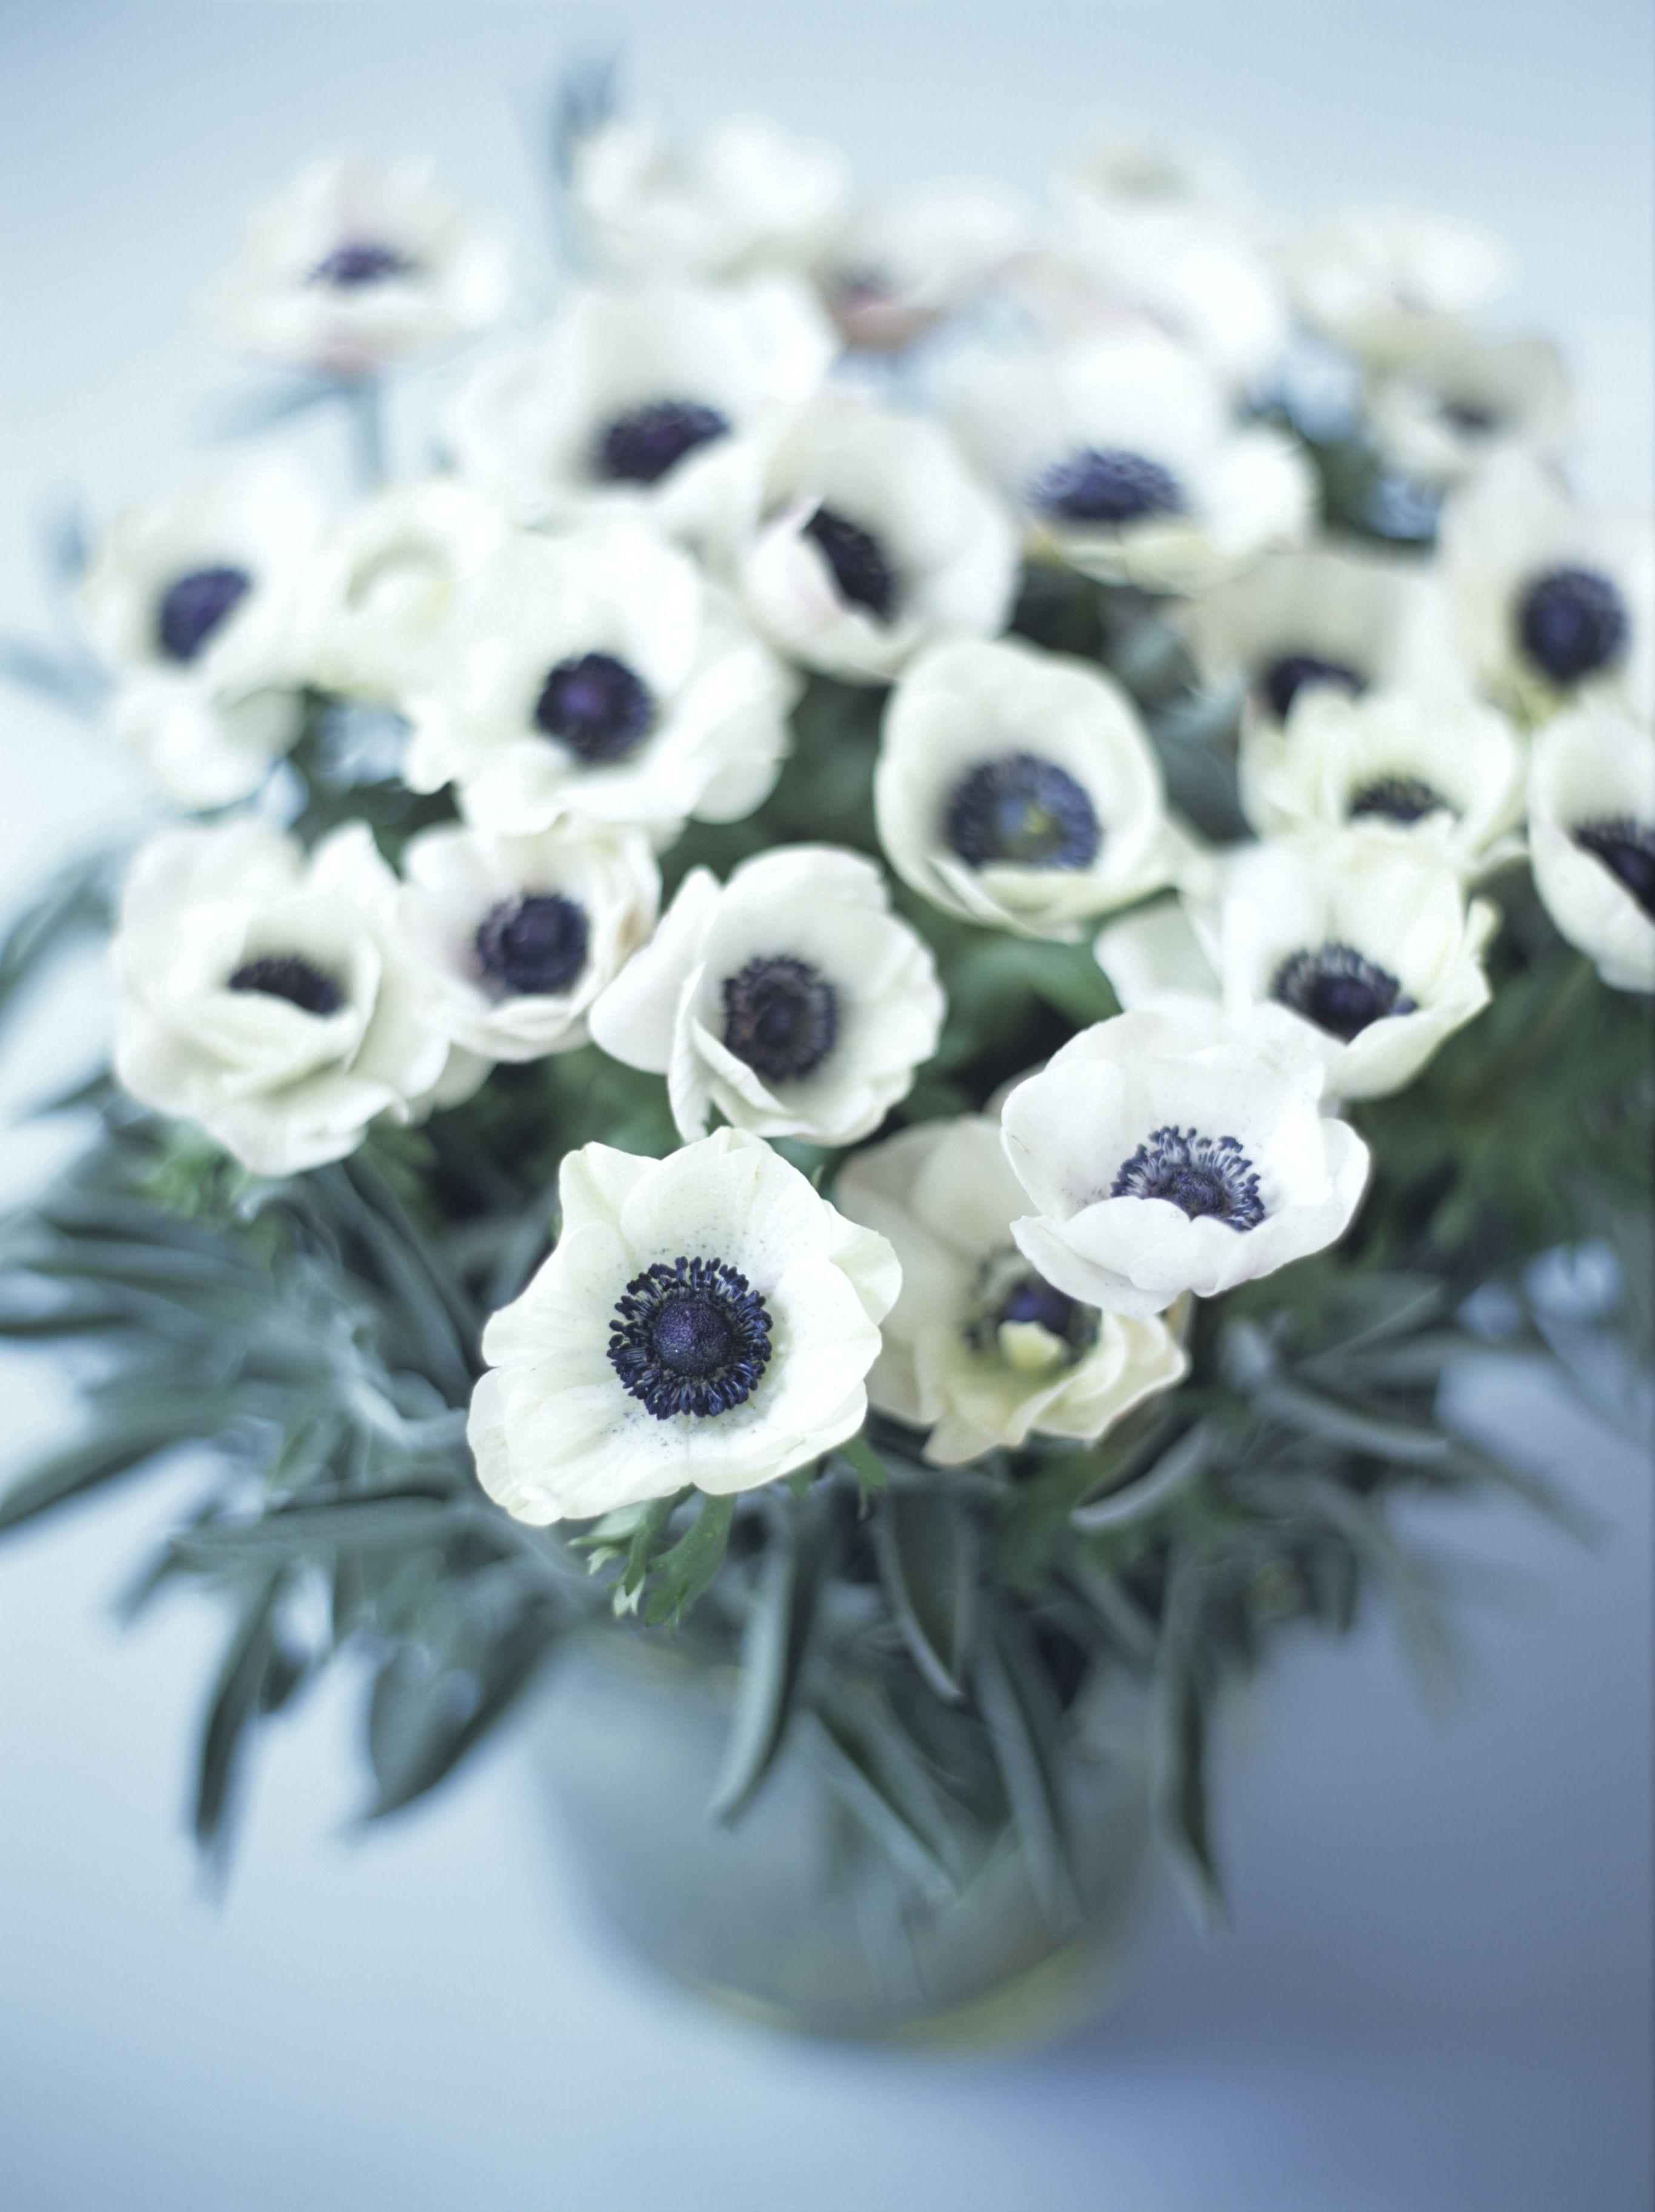 12 Flowers With Hidden Meanings Flower Meanings Beautiful Flowers Indigo Flower